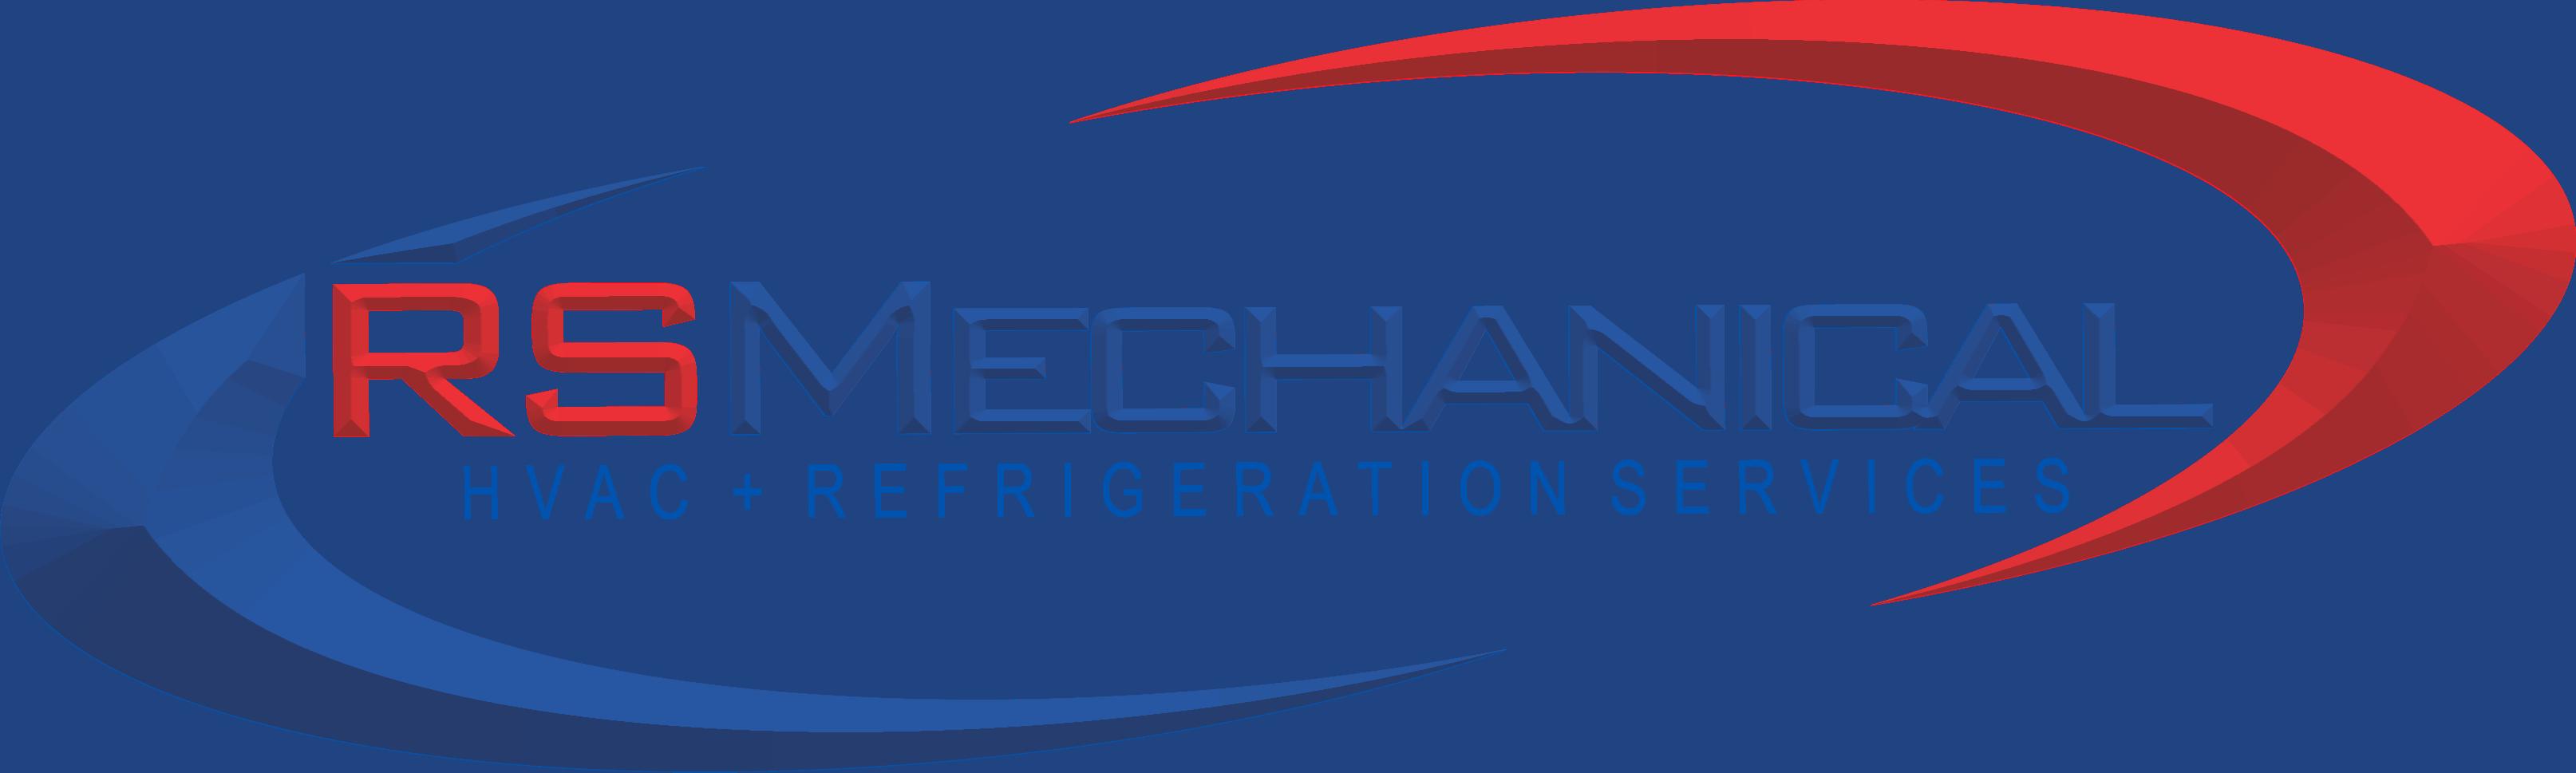 RS Mechanical logo